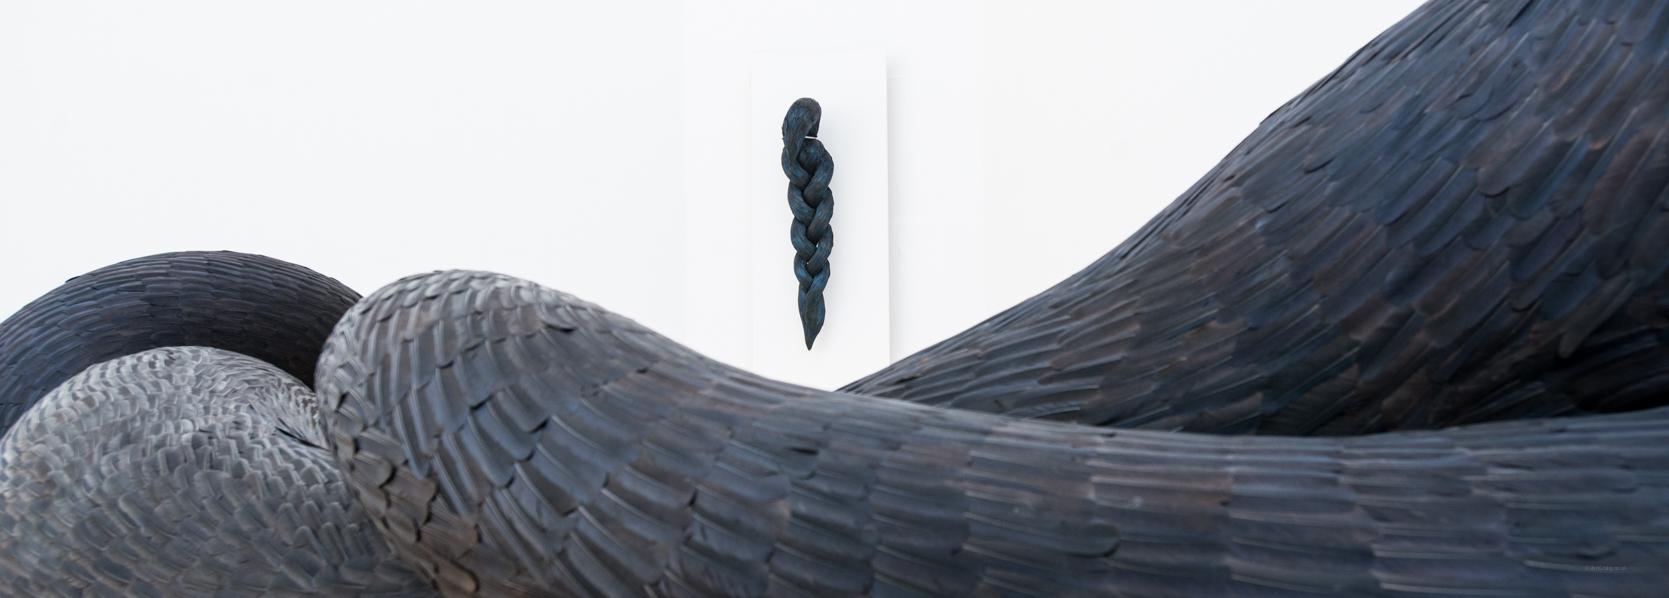 Splice & Gyre (Exhibition View),Kate MccGwire, RWA,Bristol -Photo: Jon Craig